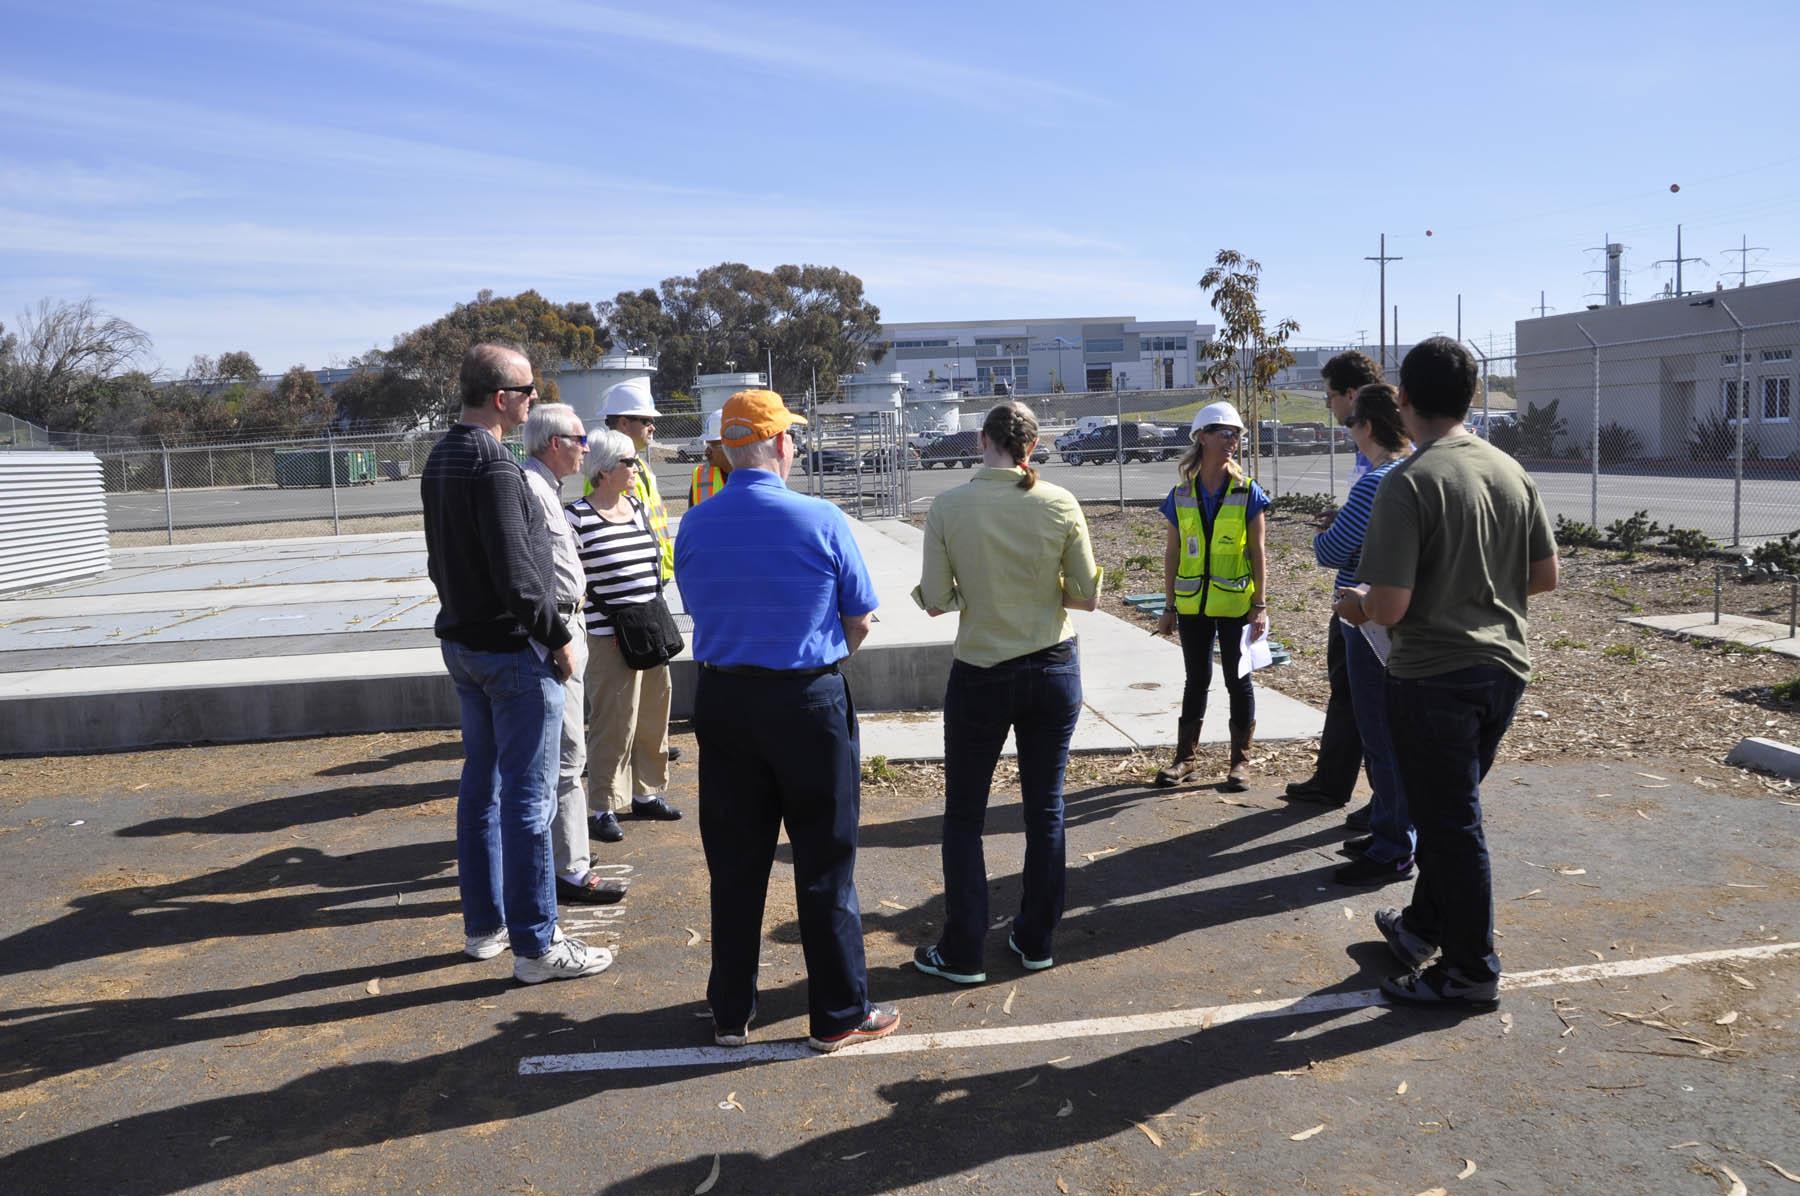 Poseidon Desalination Plant Carlsbad GrokSurf s San Diego